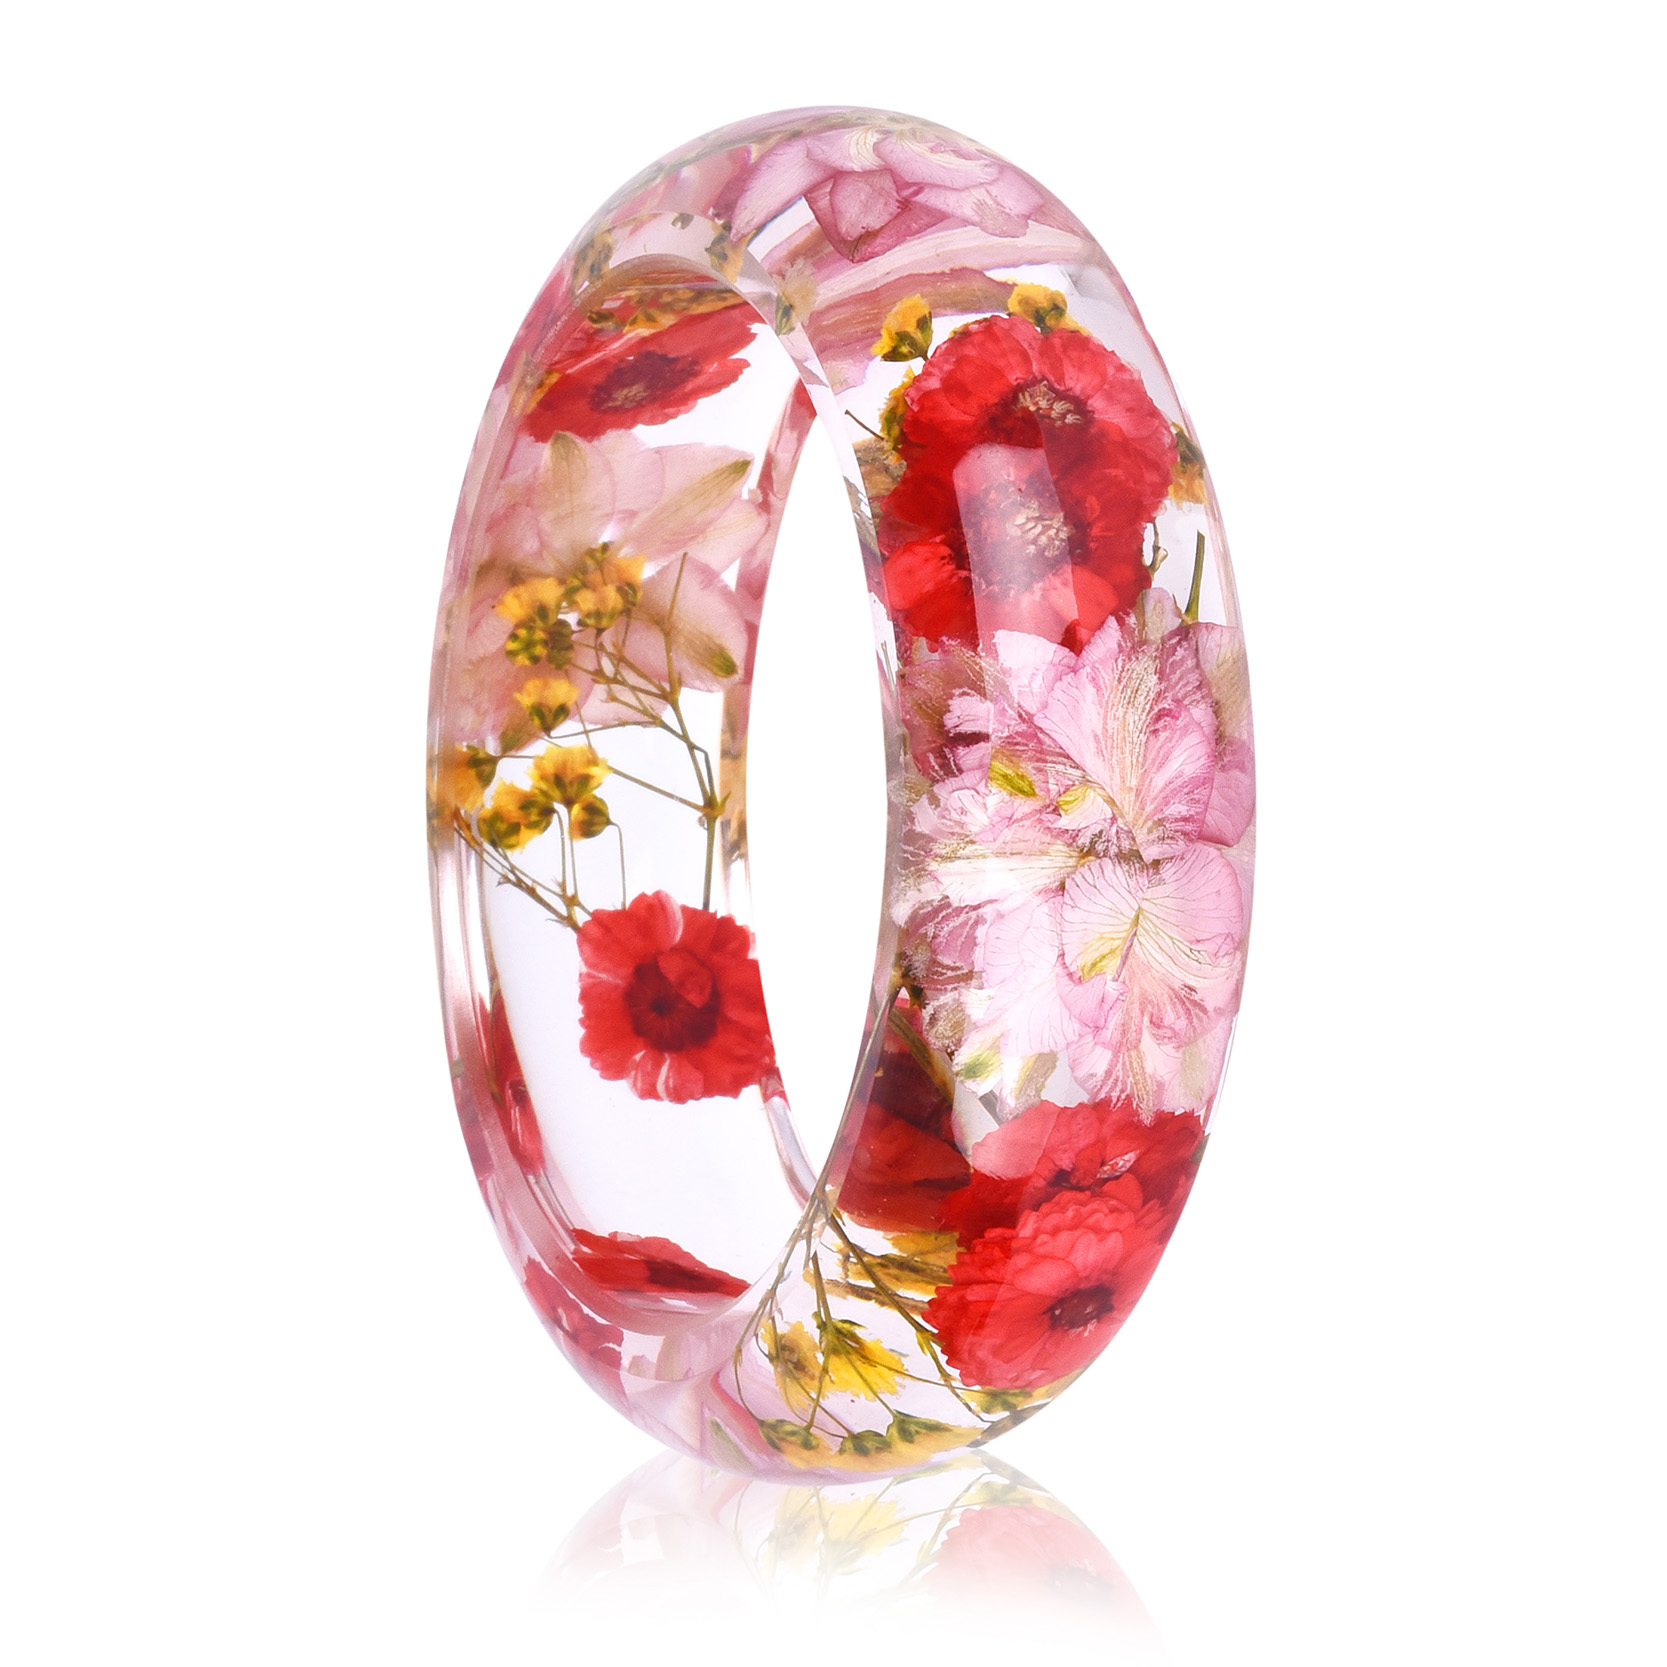 2018 New Dried Flower Resin Bracelet Bangle Real Flower Inside of Bangle Jewelry Best Gift